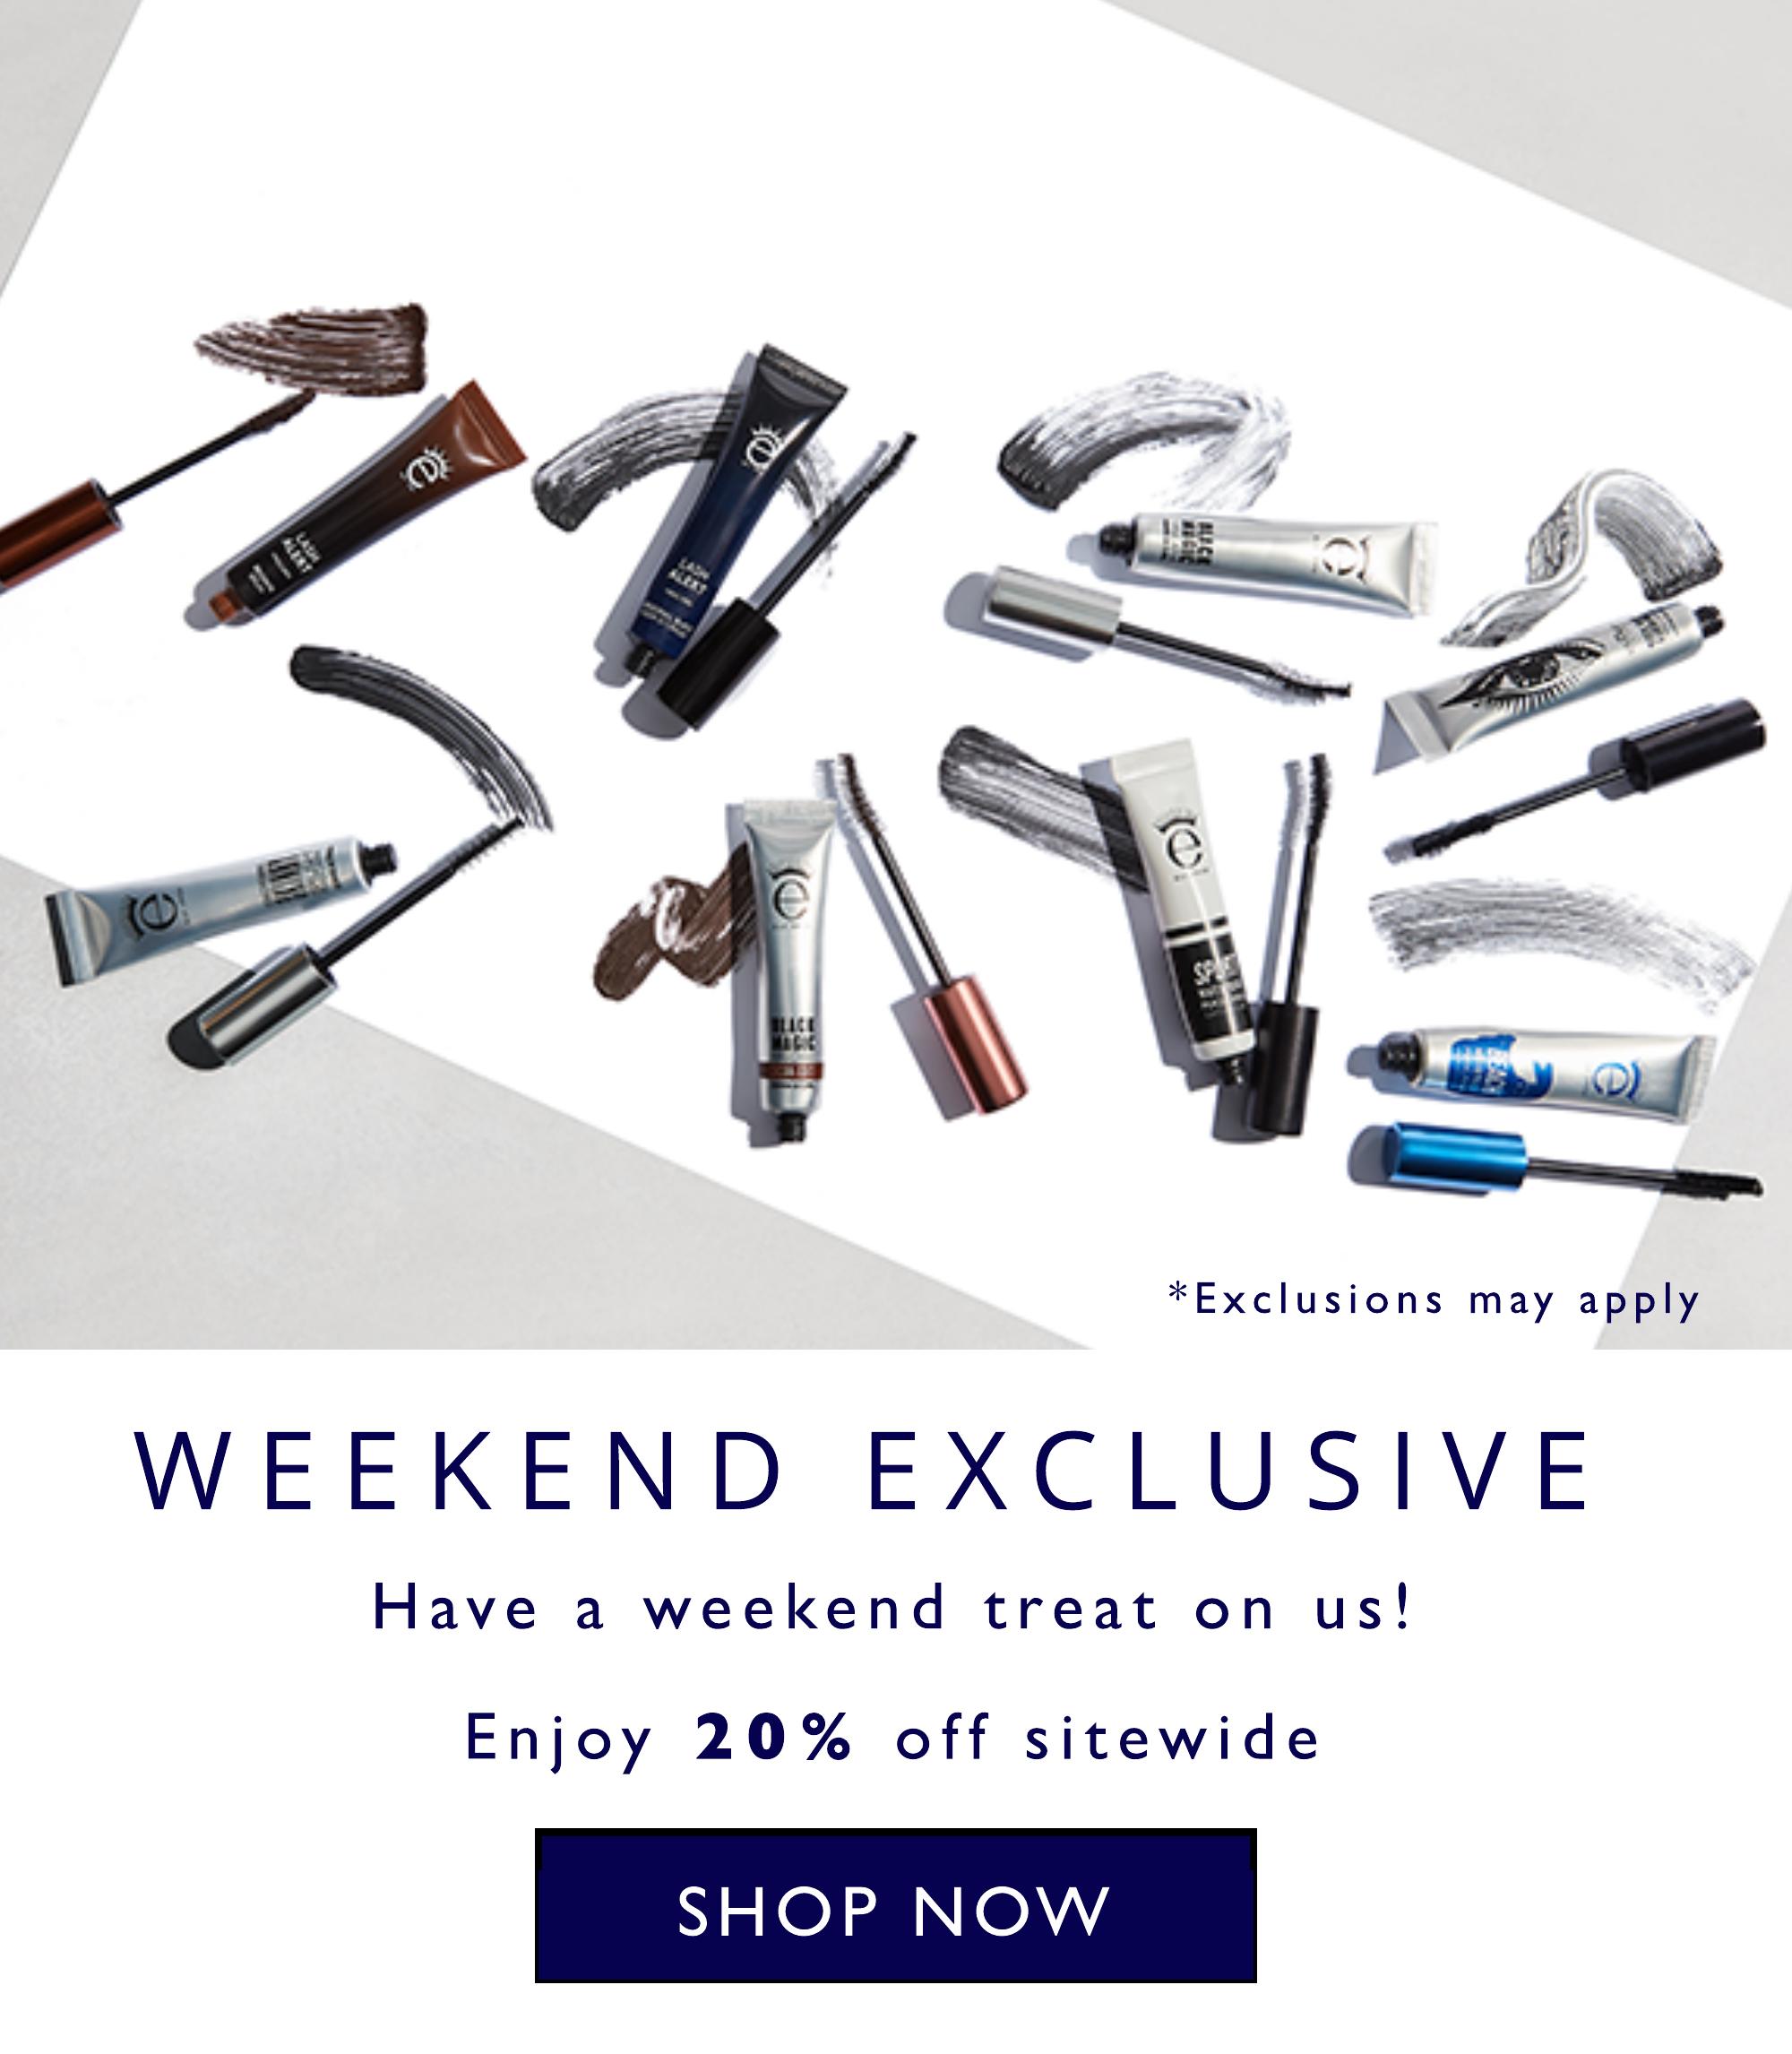 20% off weekend exclusive